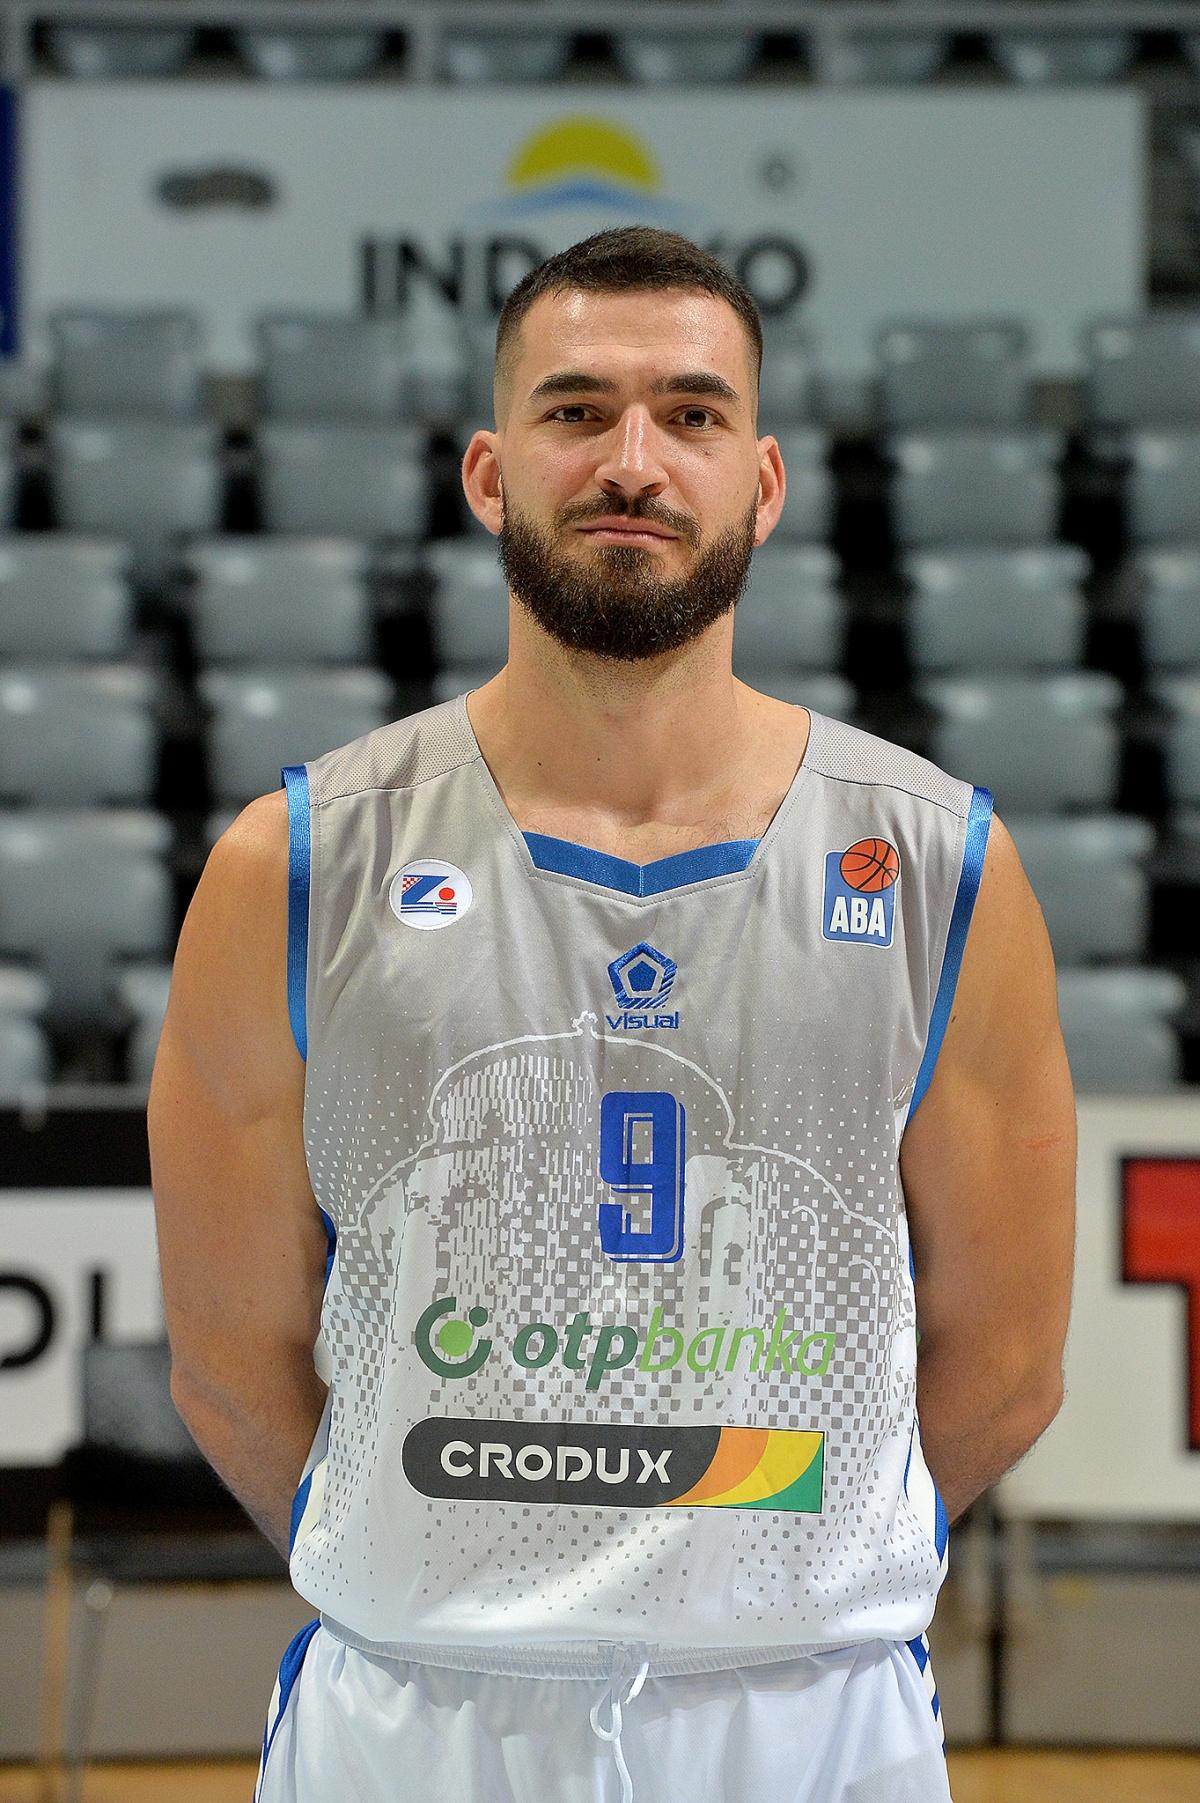 Kristijan Krajina